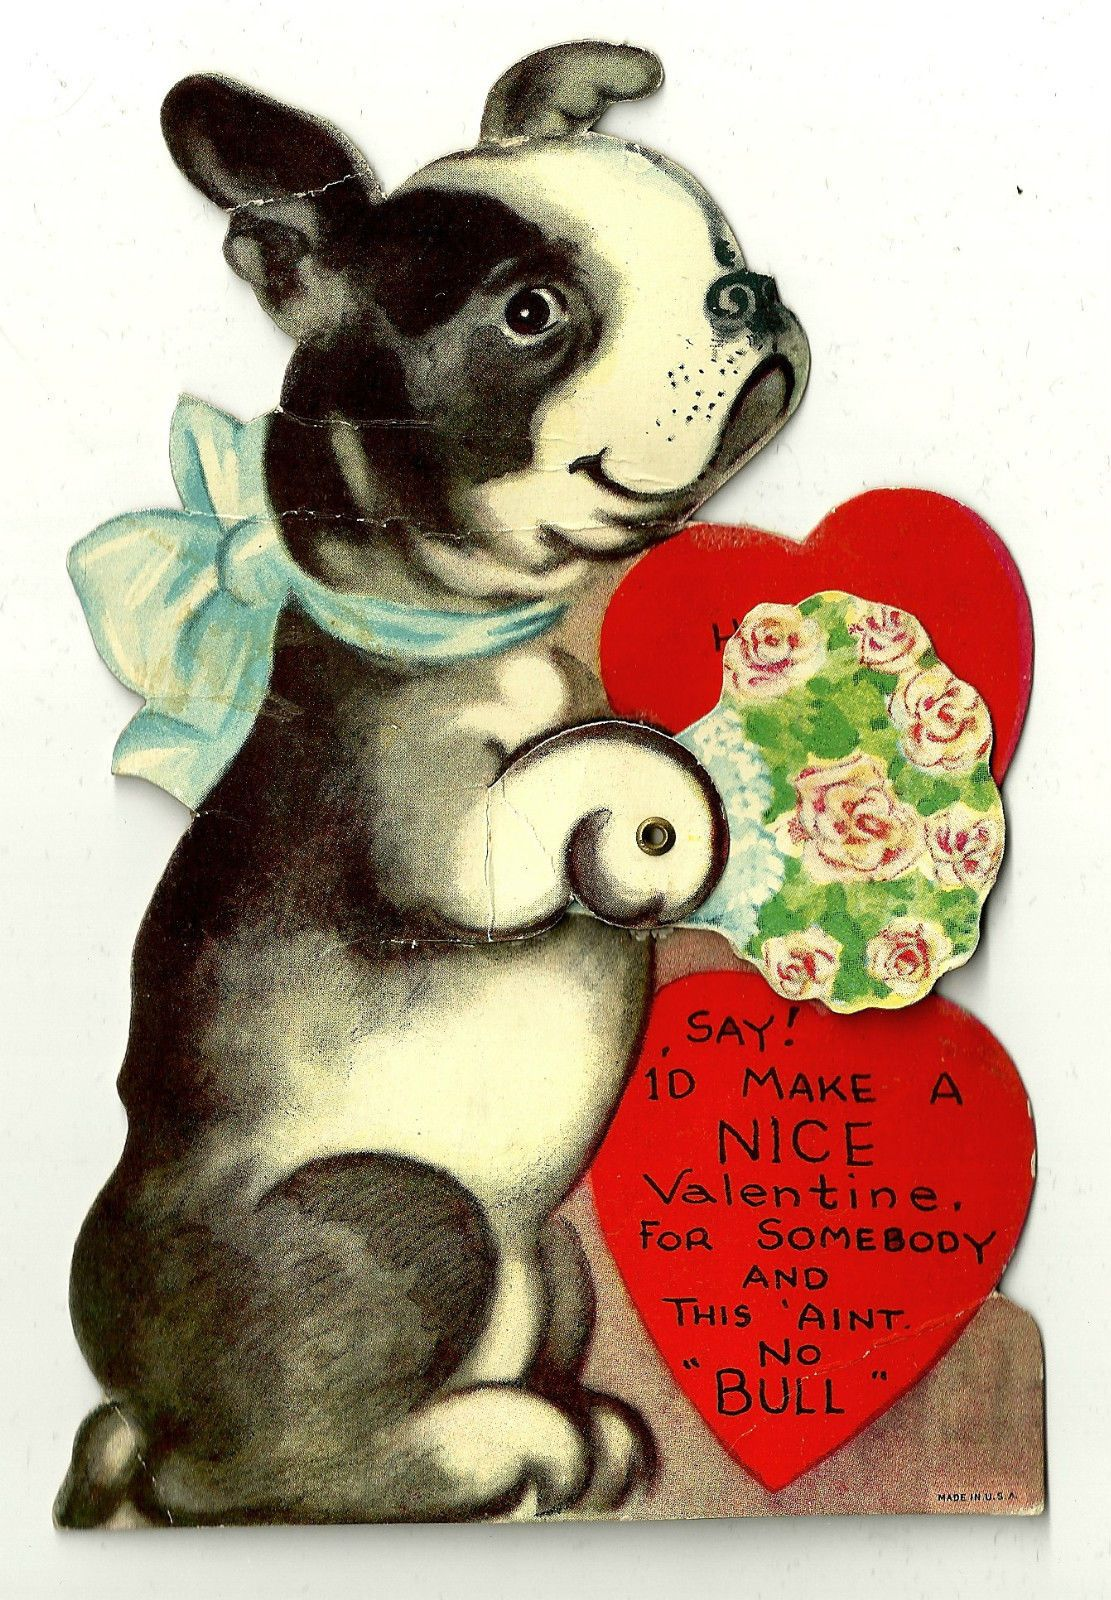 Boston Terrier Puppy Dog With Valentine Greeting Ain T No Bull Vintage Card Ebay Dog Valentines Boston Terrier Art Boston Terrier Puppy